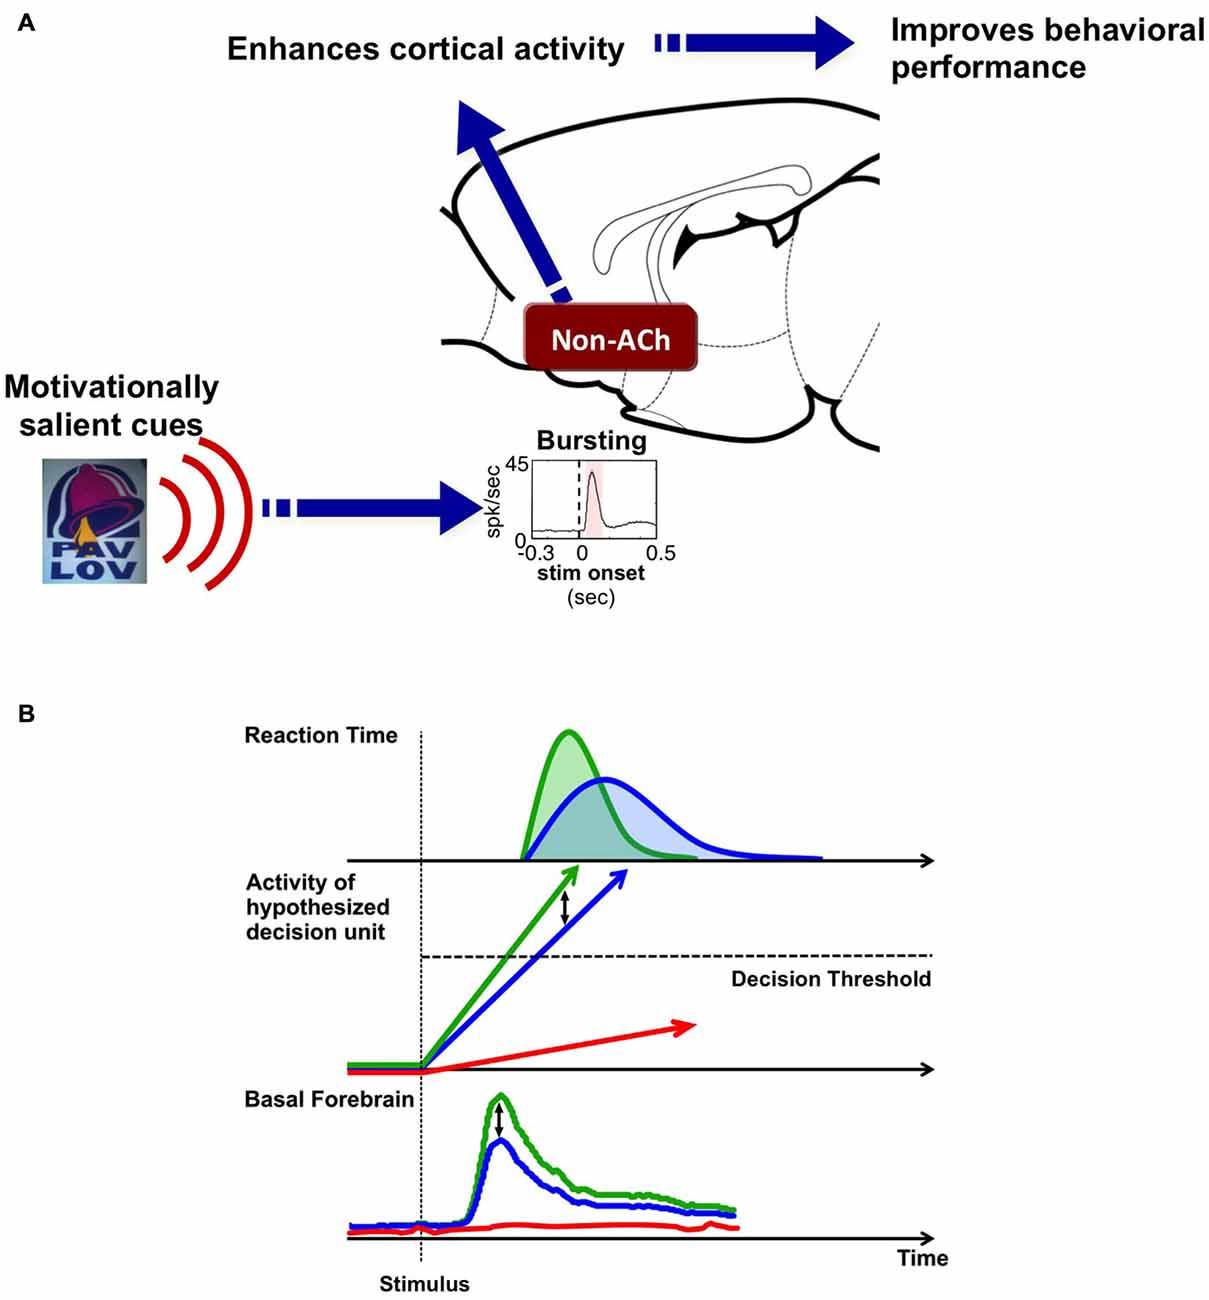 Frontiers | Basal forebrain motivational salience signal enhances ...